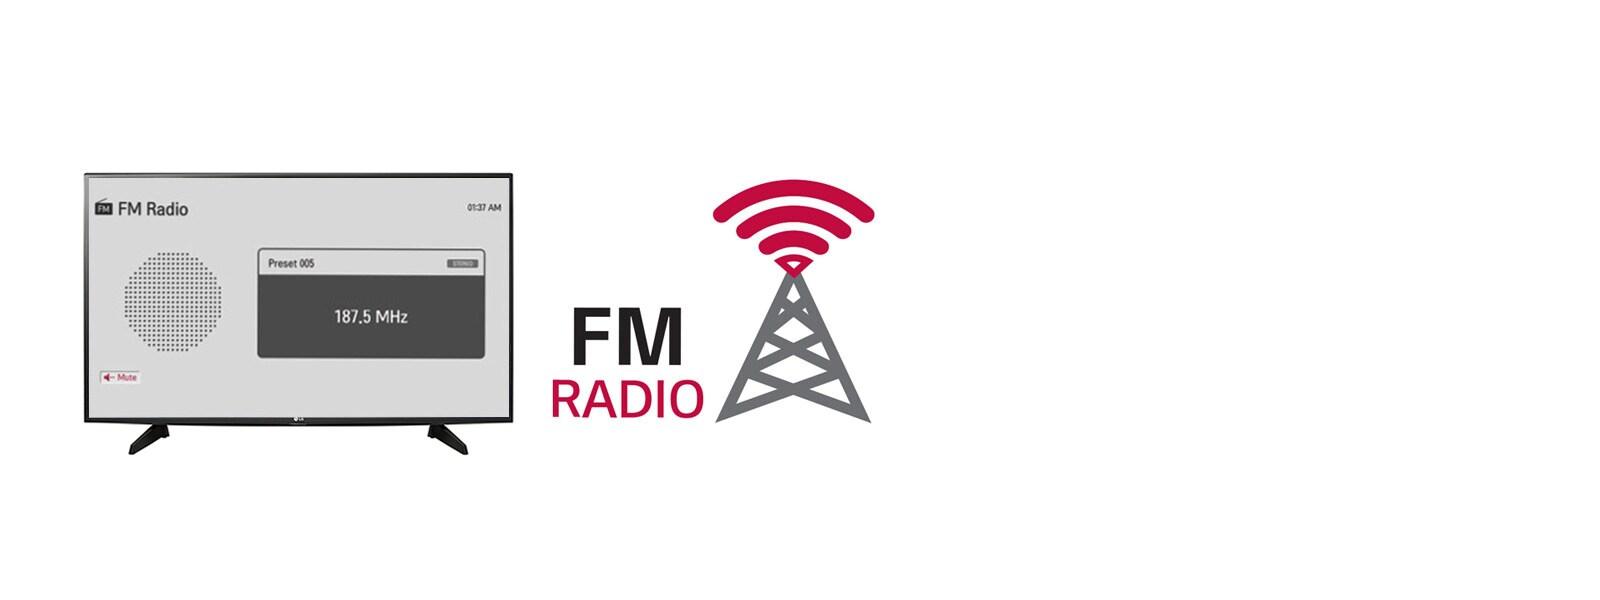 LG FM Radio LED TV